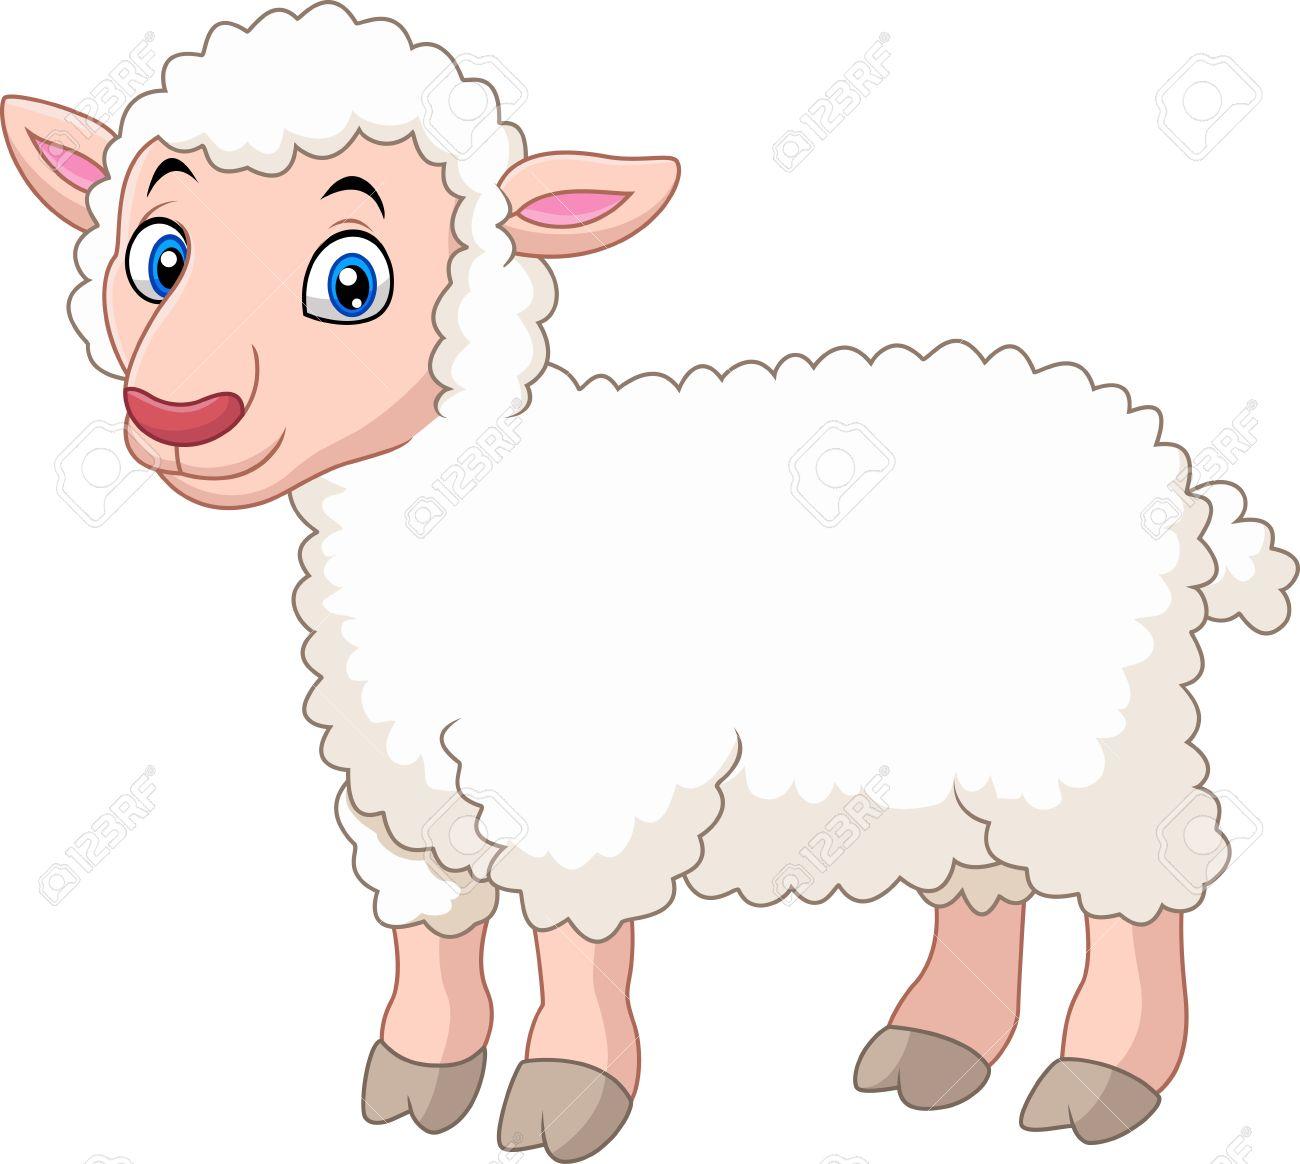 cartoon lamb royalty free cliparts vectors and stock illustration rh 123rf com baby lamb cartoon images lamb cartoon pictures